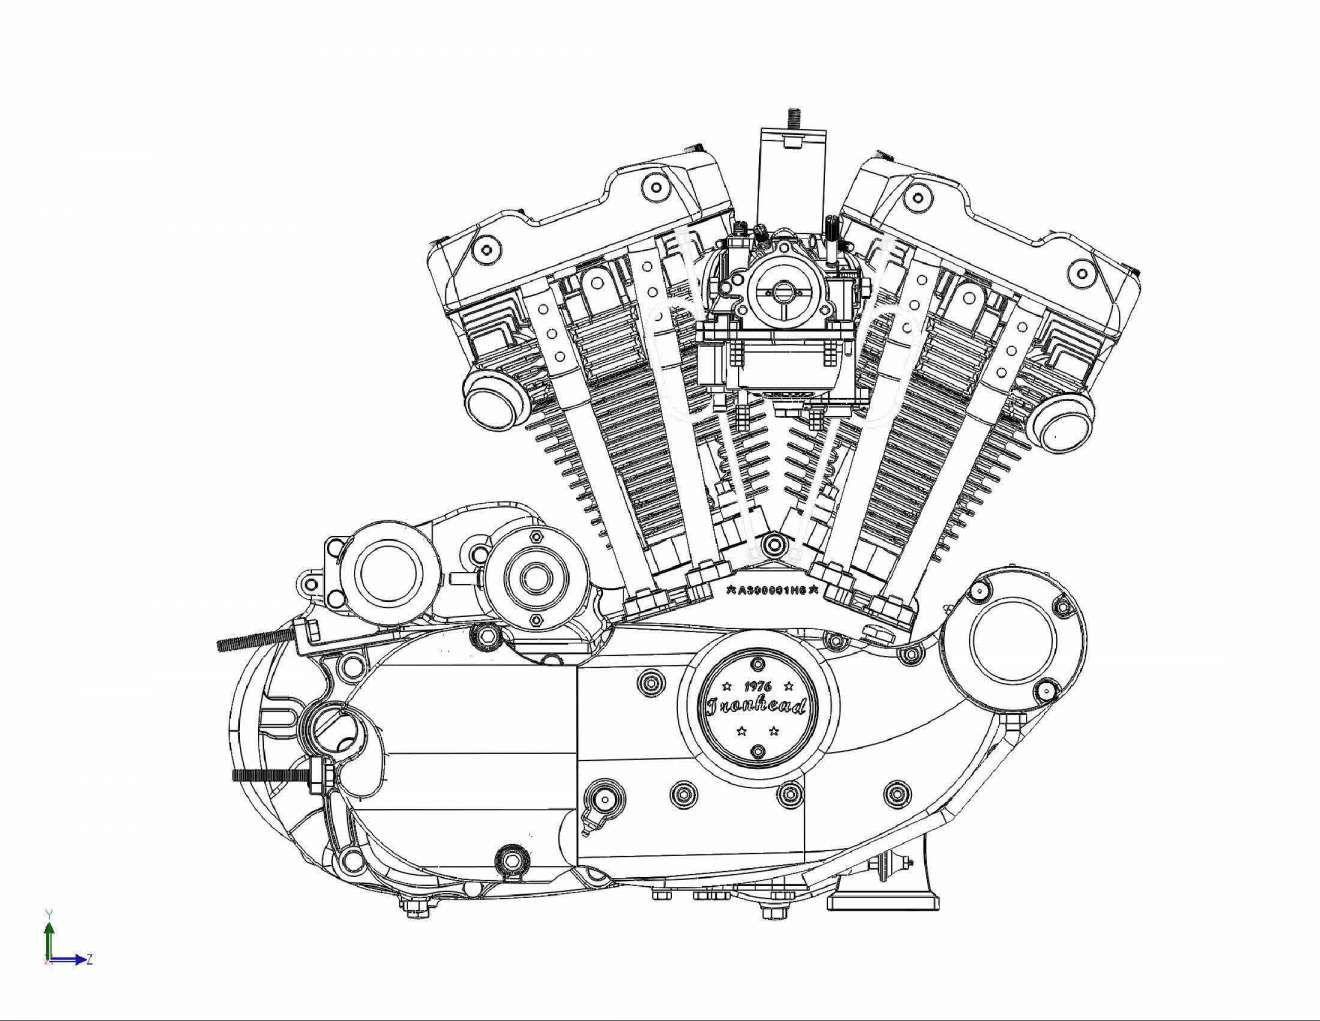 Motorcycle Engine Diagram Engineering Drawings and